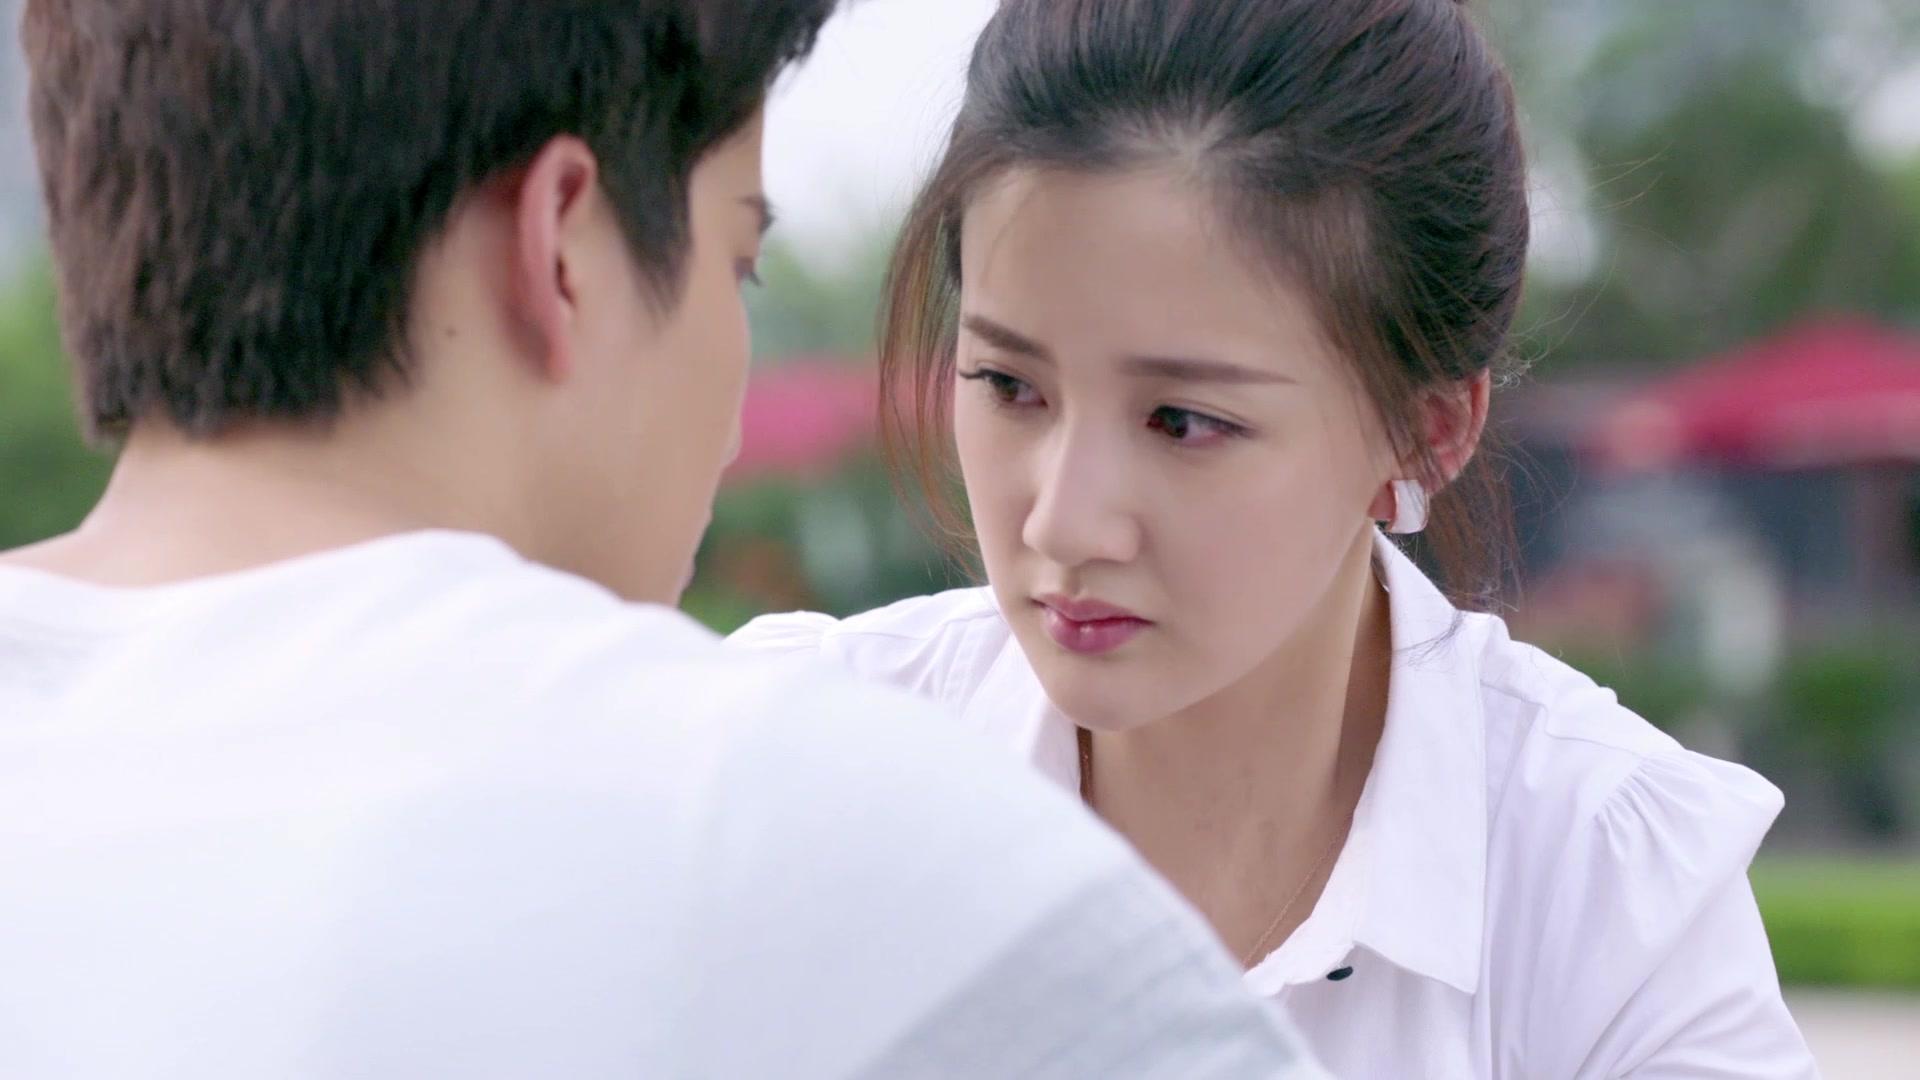 Jianmeng chen fdating